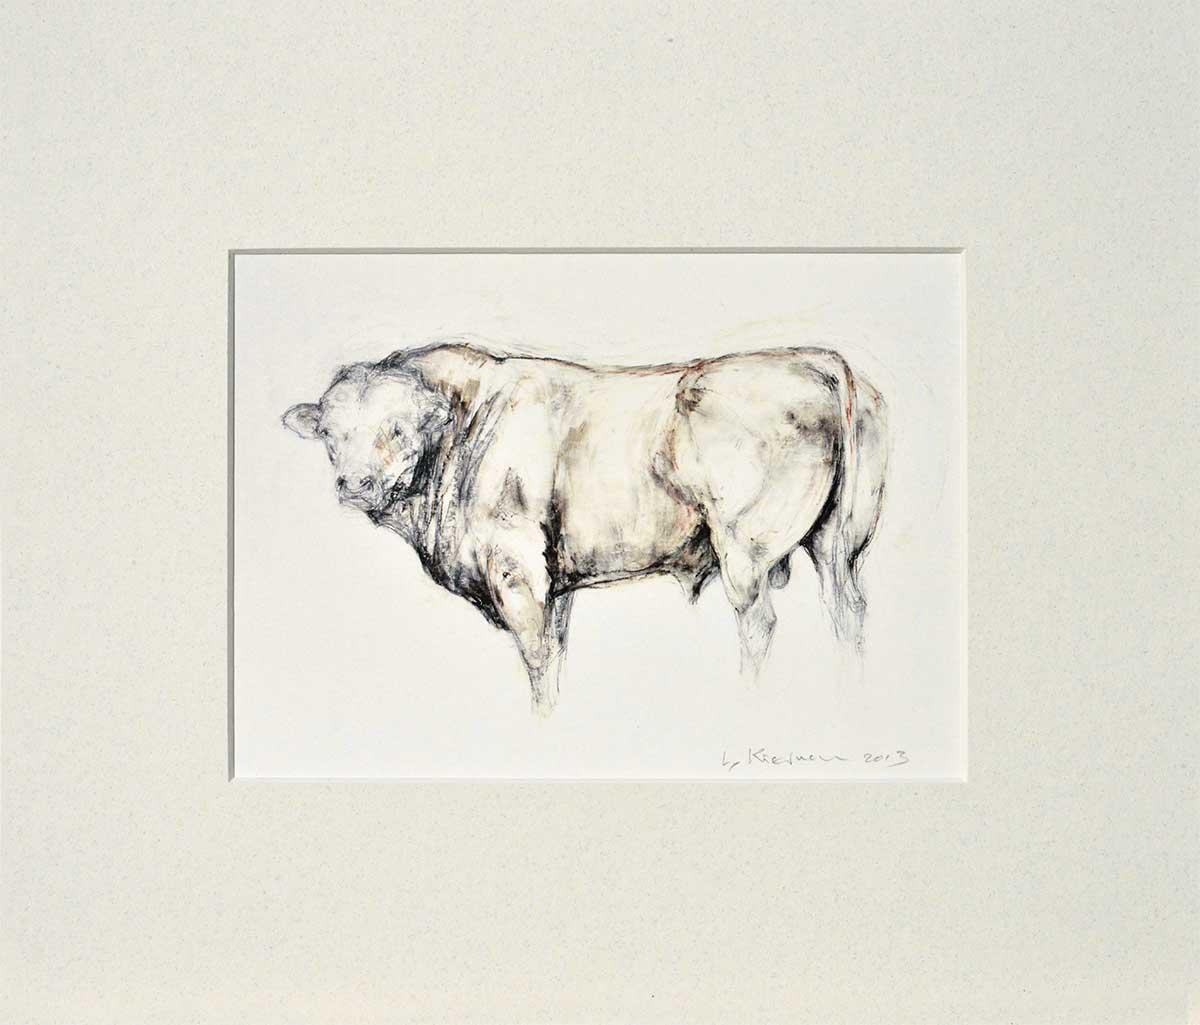 English Bull mounted print